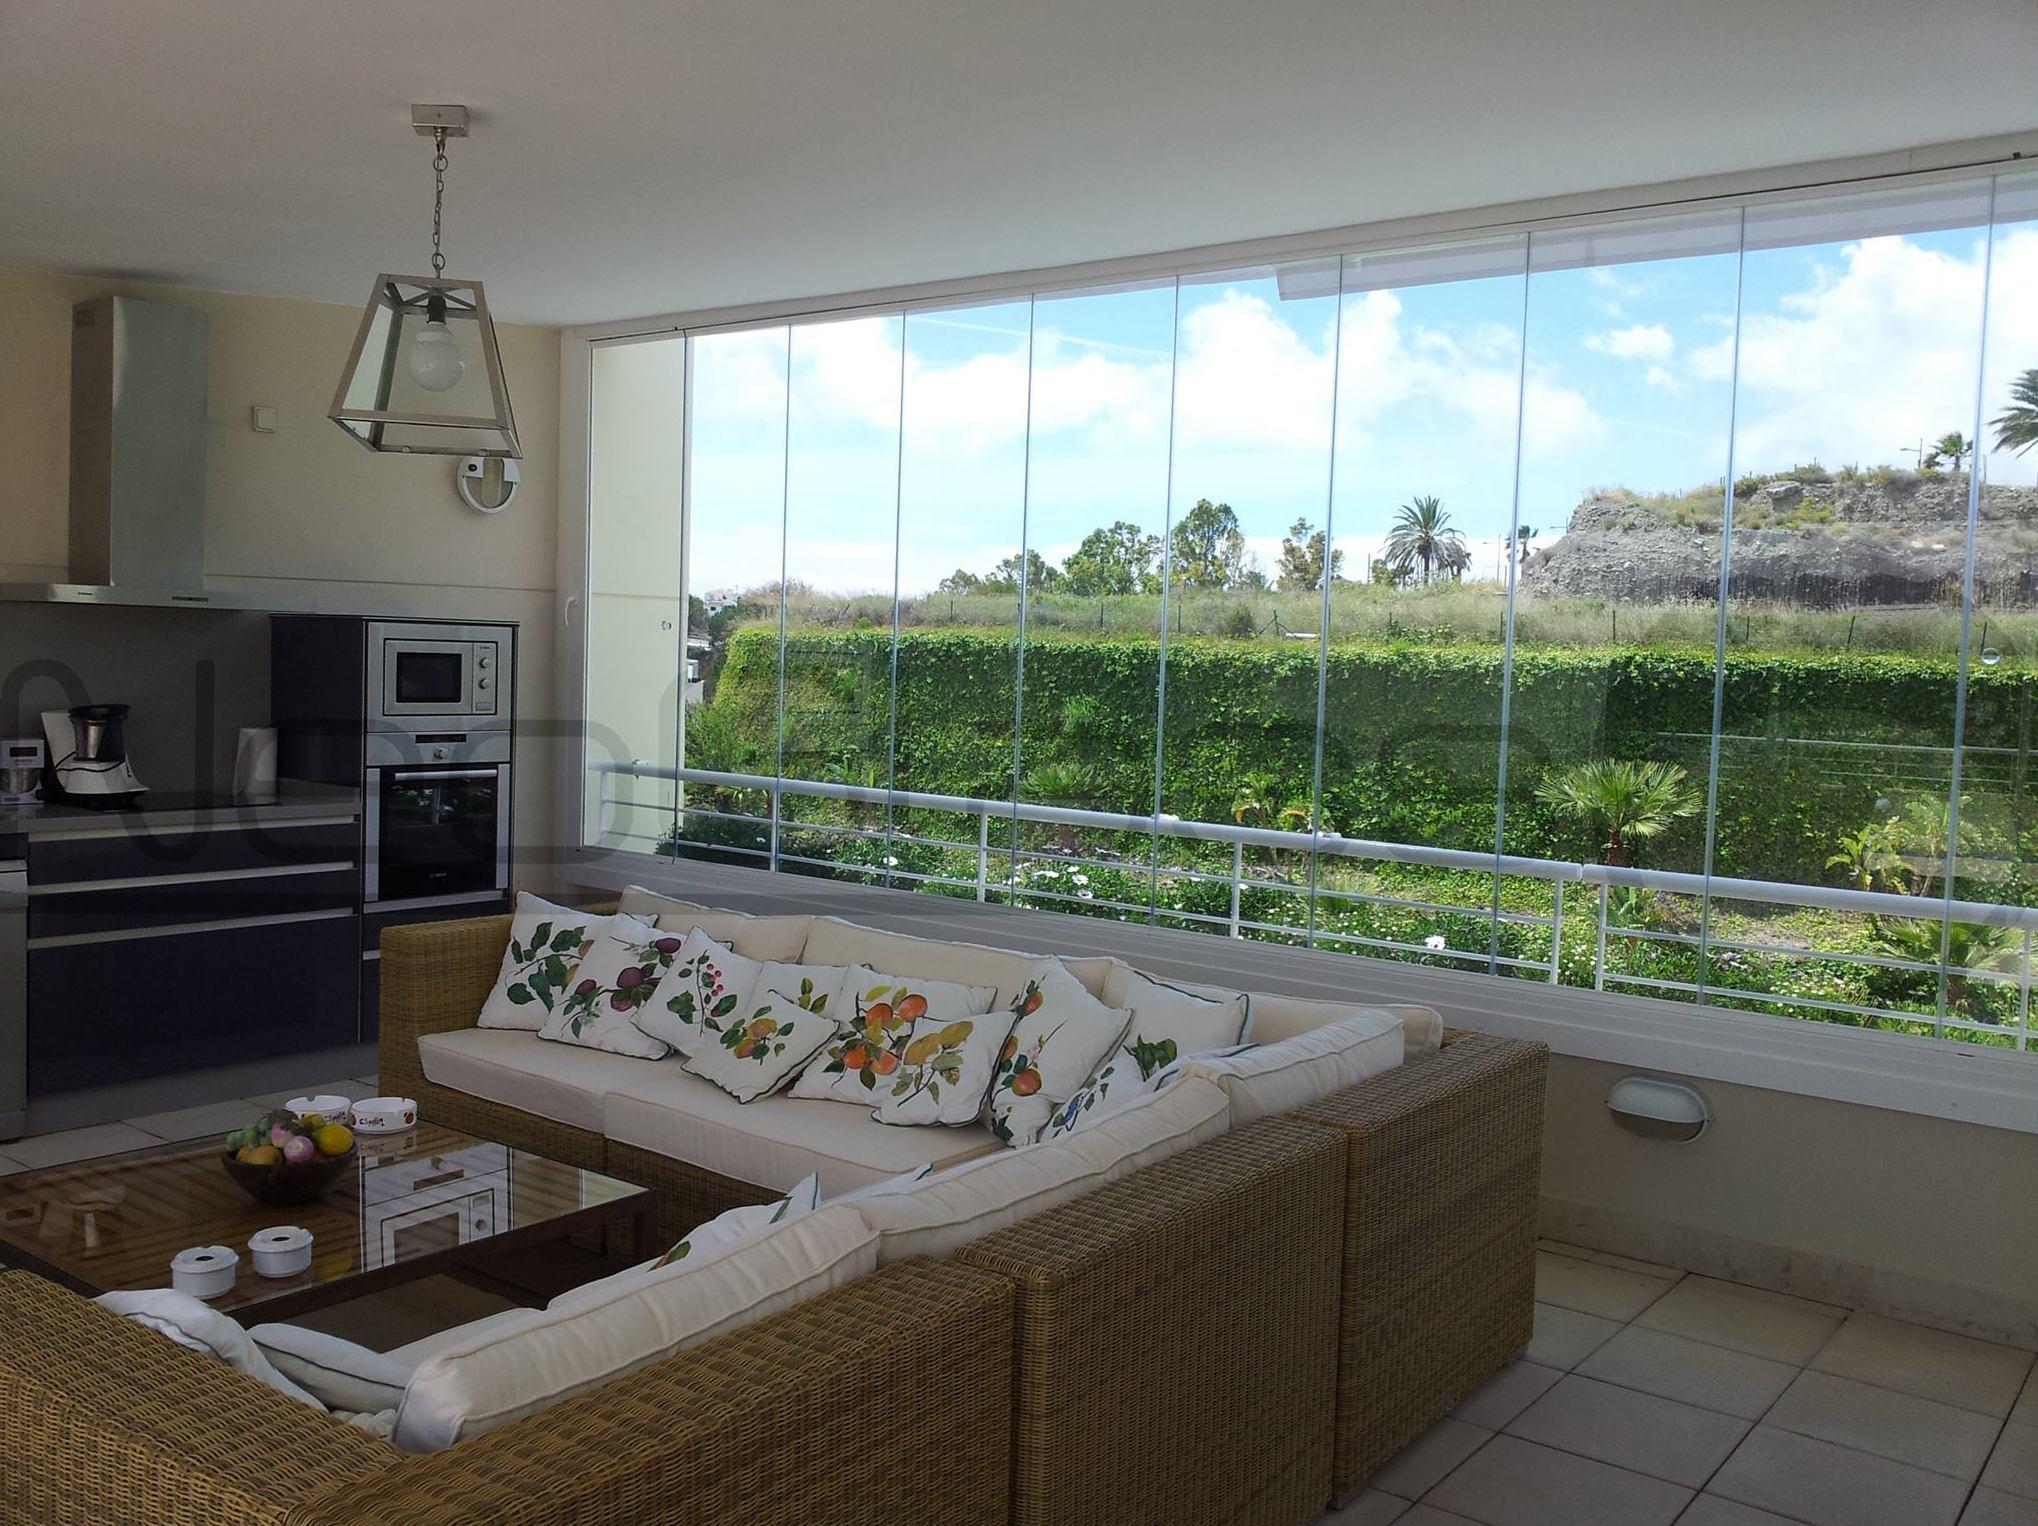 Large glass curtain windows